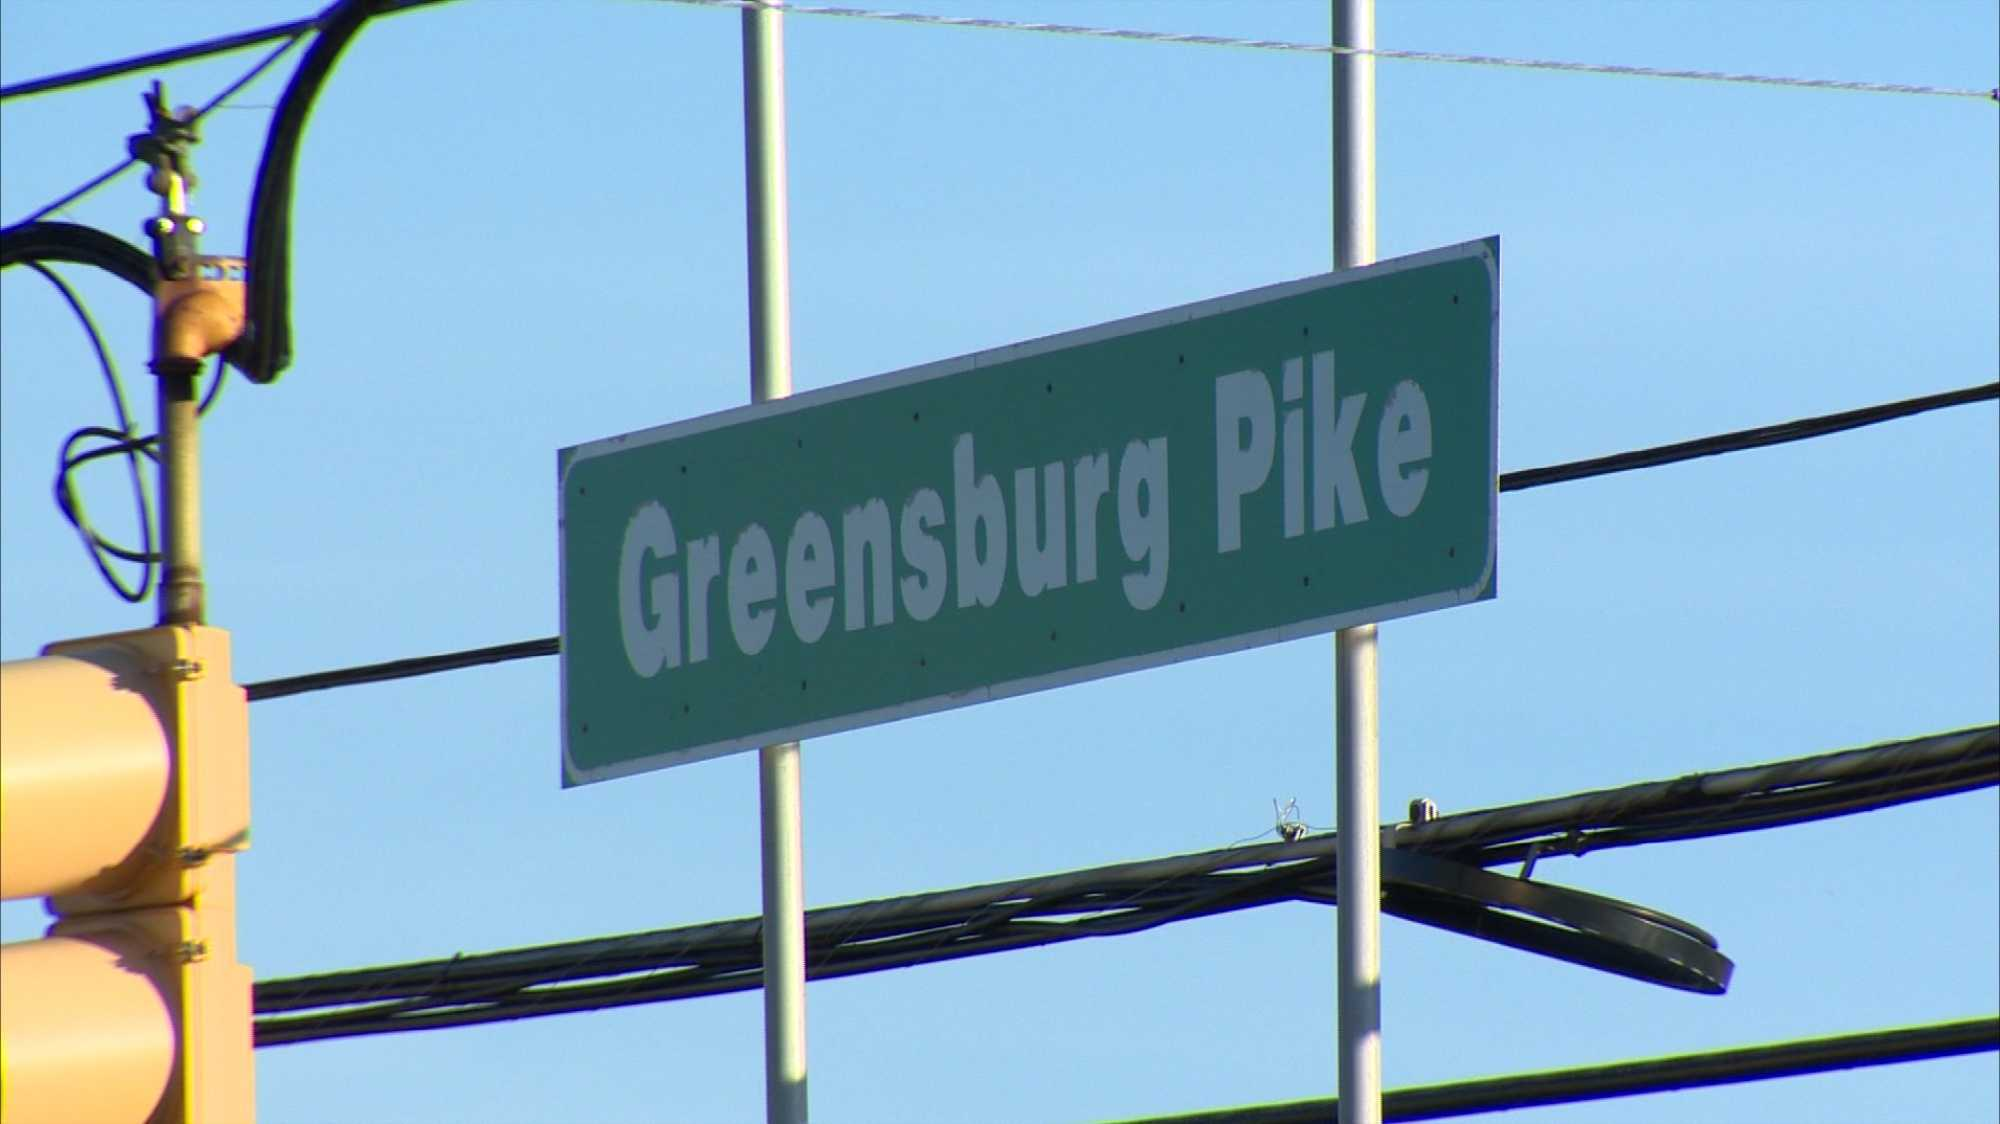 Greensburg Pike